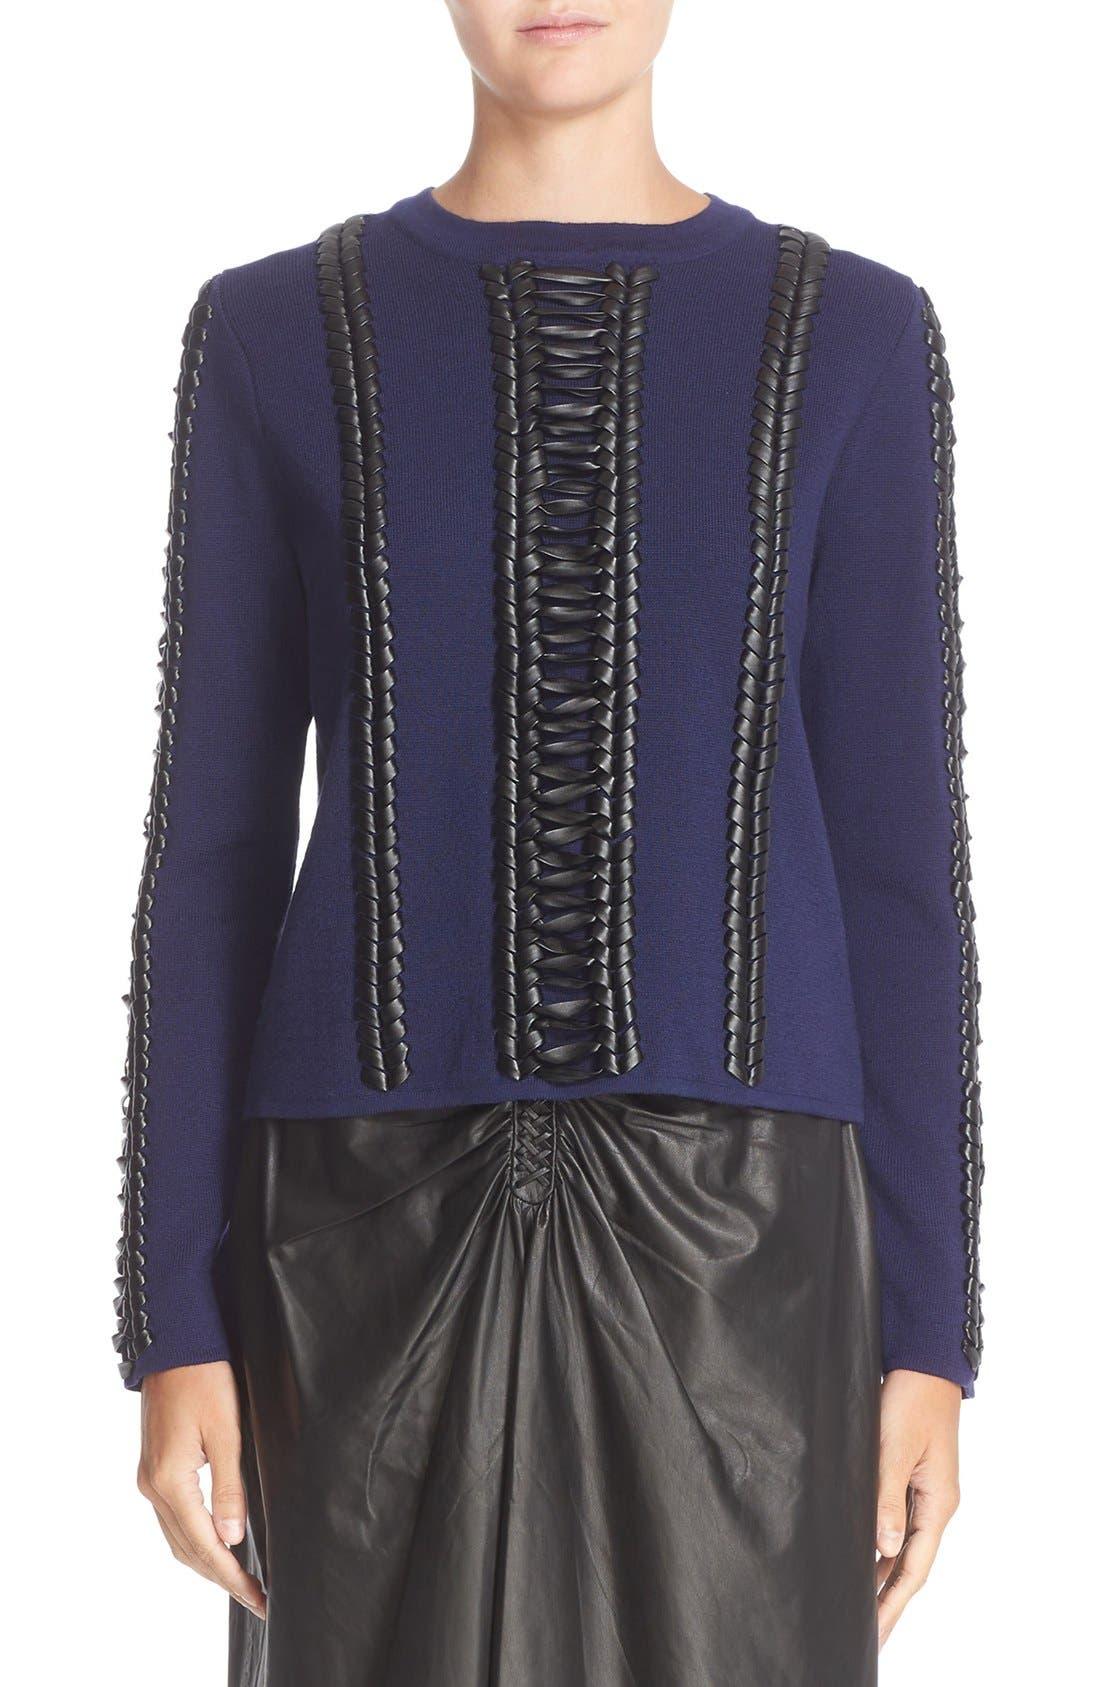 Main Image - Altuzarra Deals Lace Detail Wool Sweater